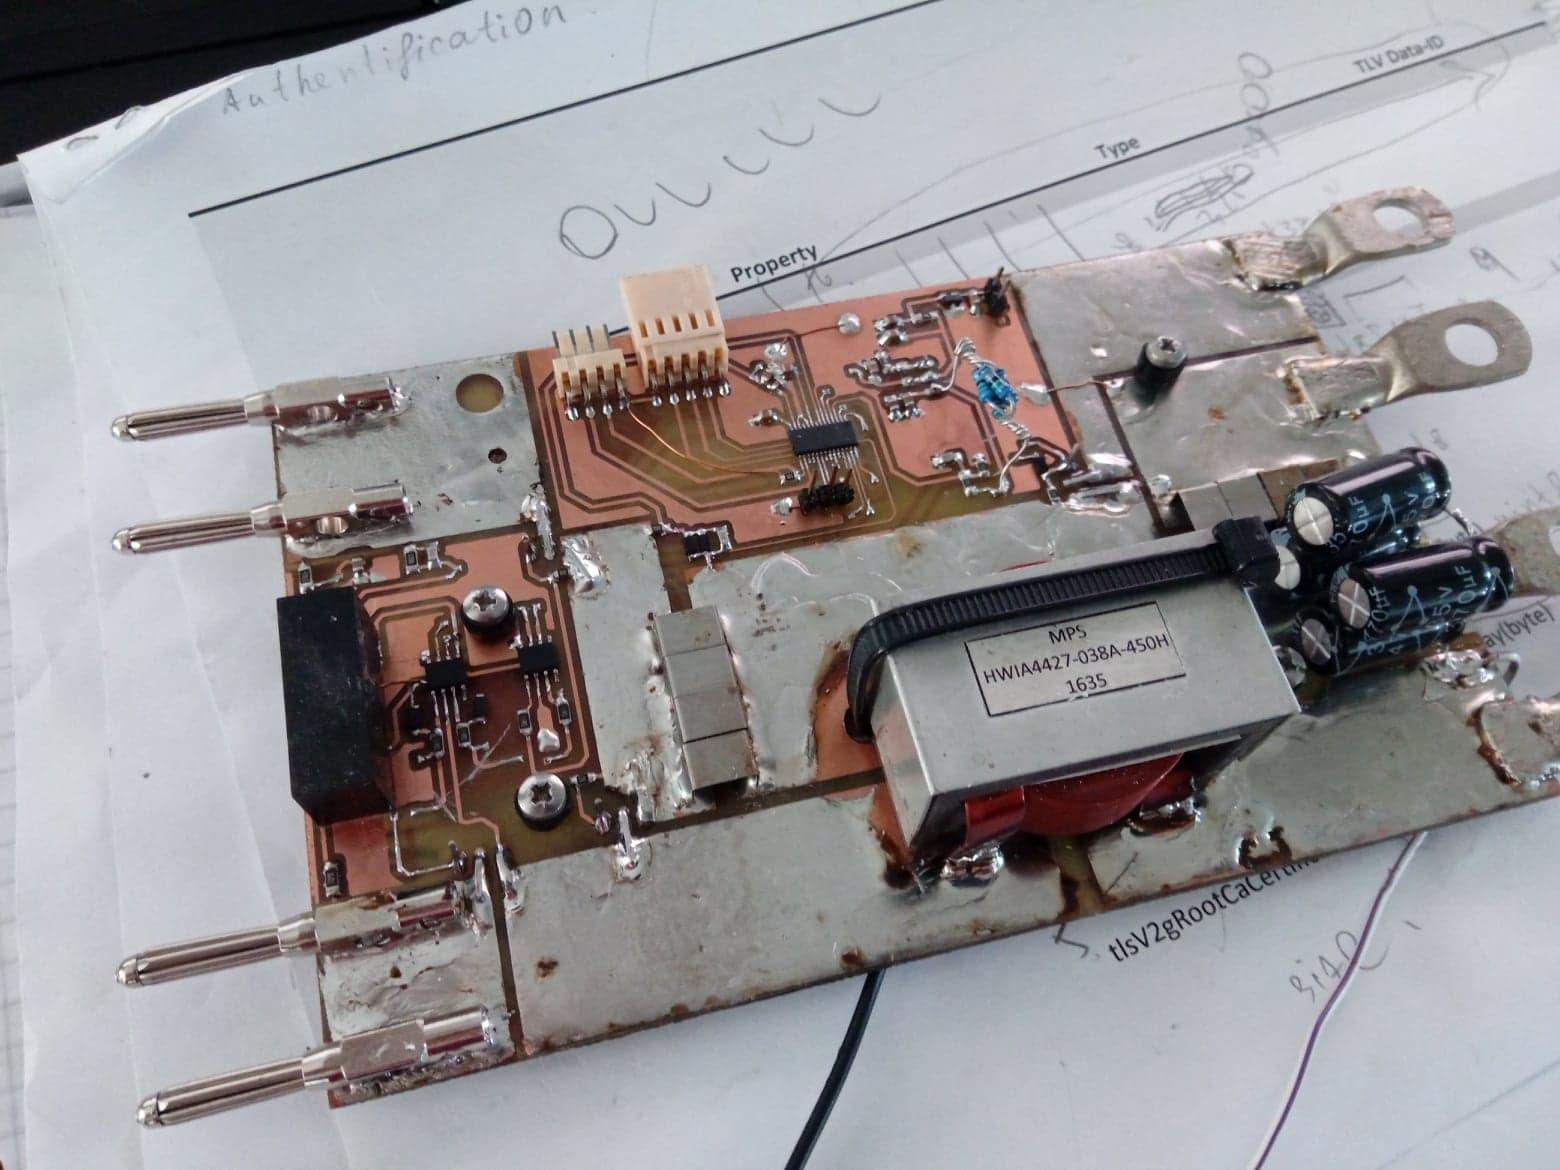 MSP430I2041: MPPT on msp430i - MSP low-power microcontroller